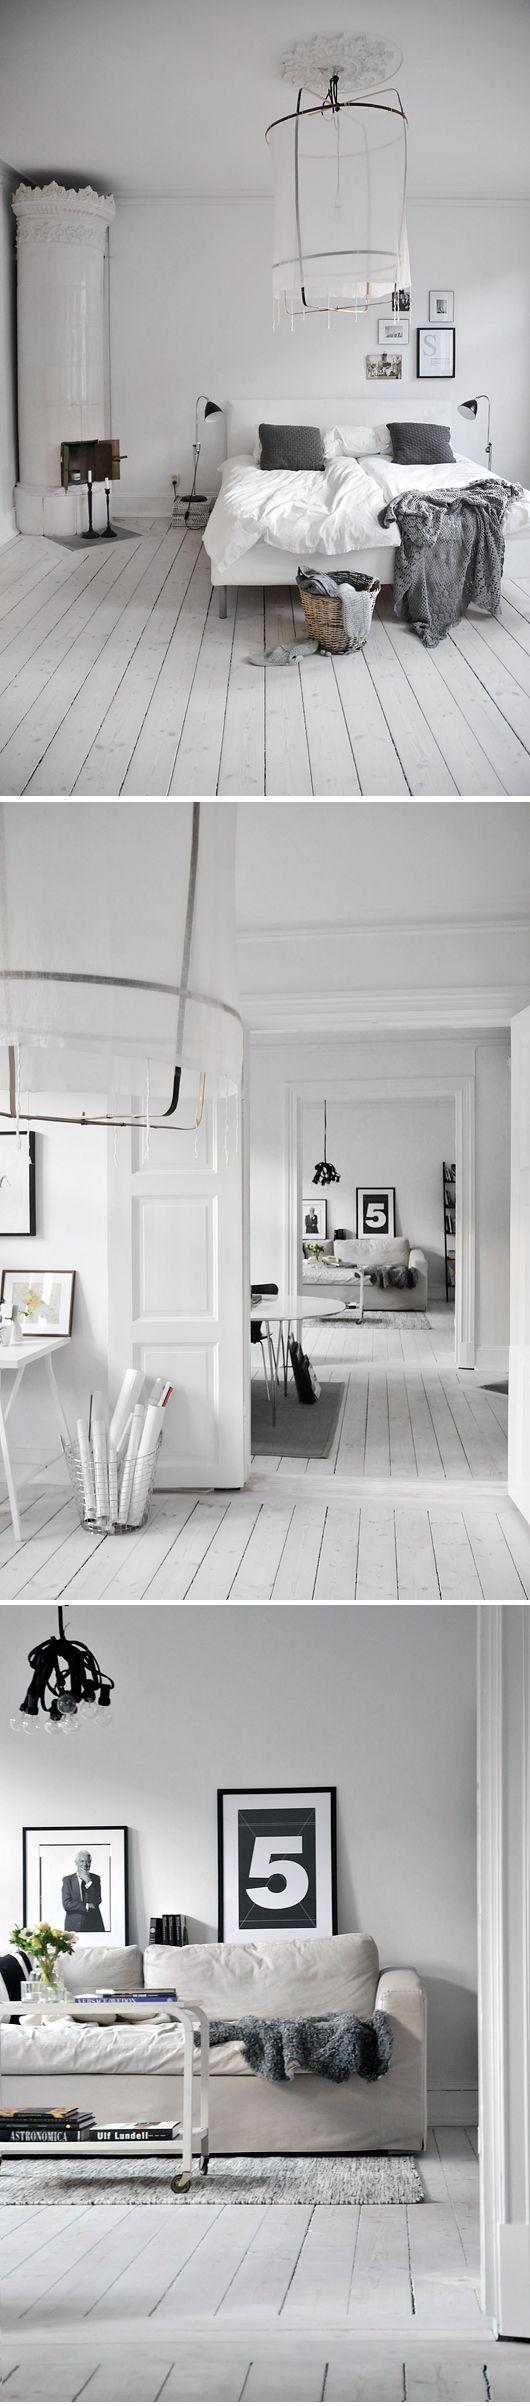 95 best breezeway images on Pinterest | Basement stairway ...